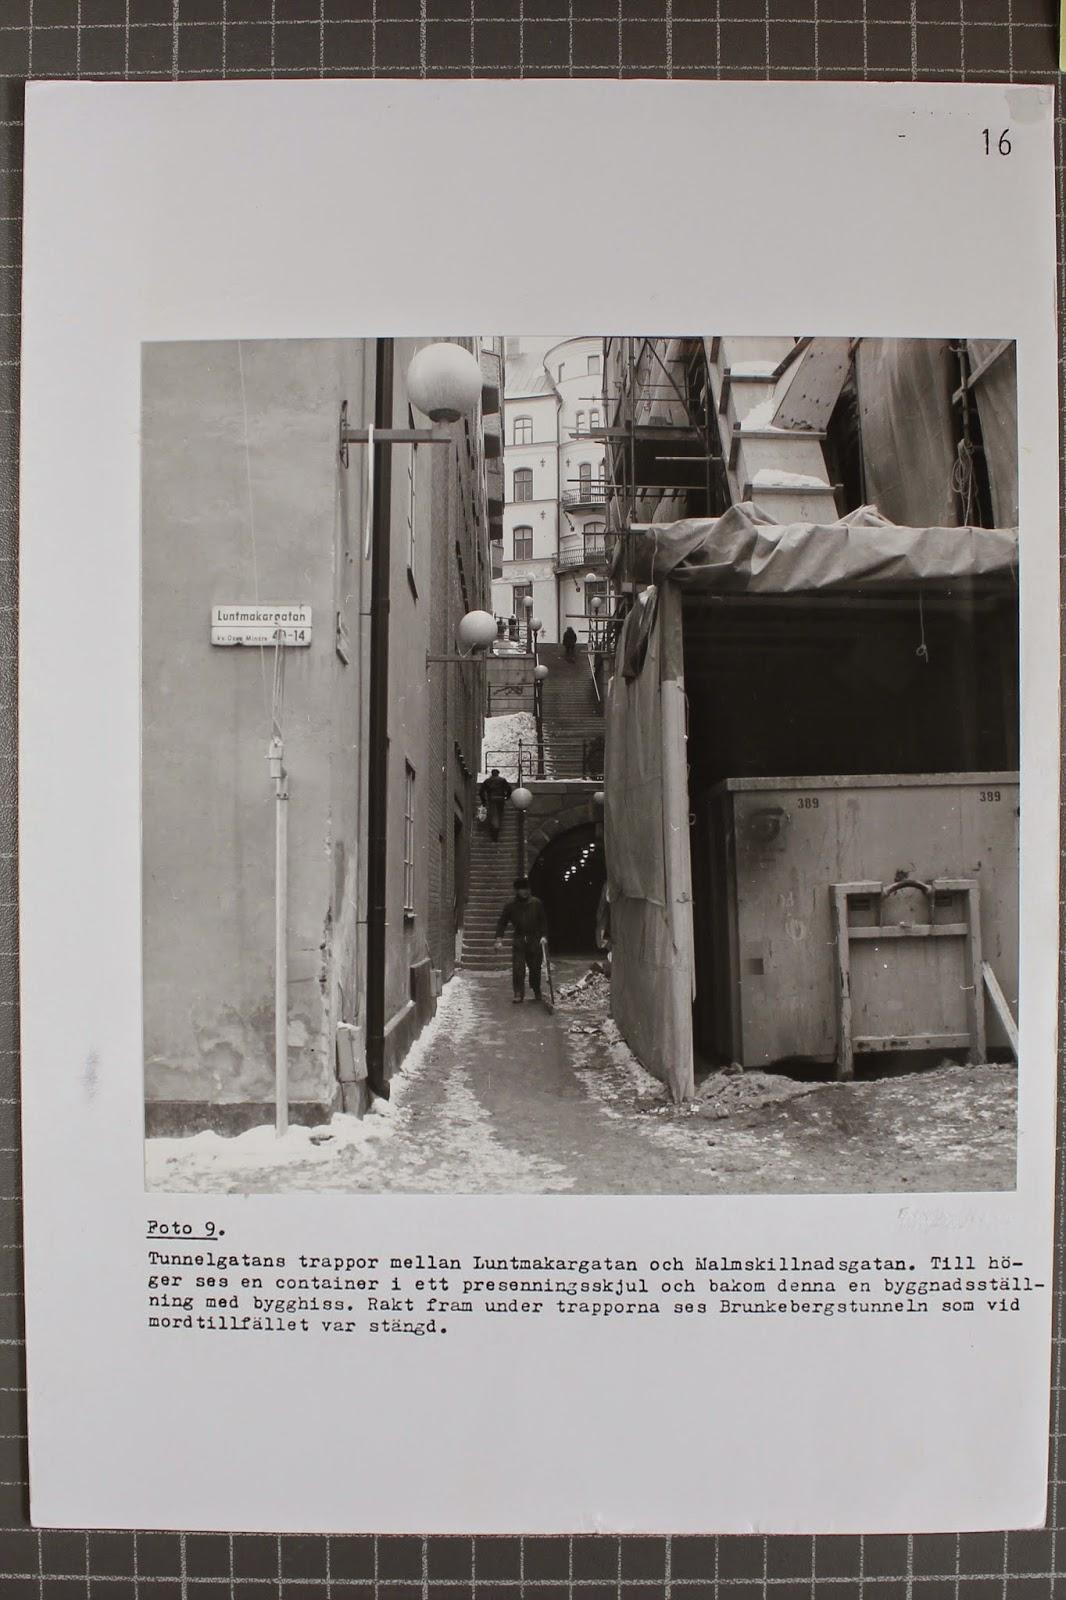 Brottsplatsfoton Palmemordet 10